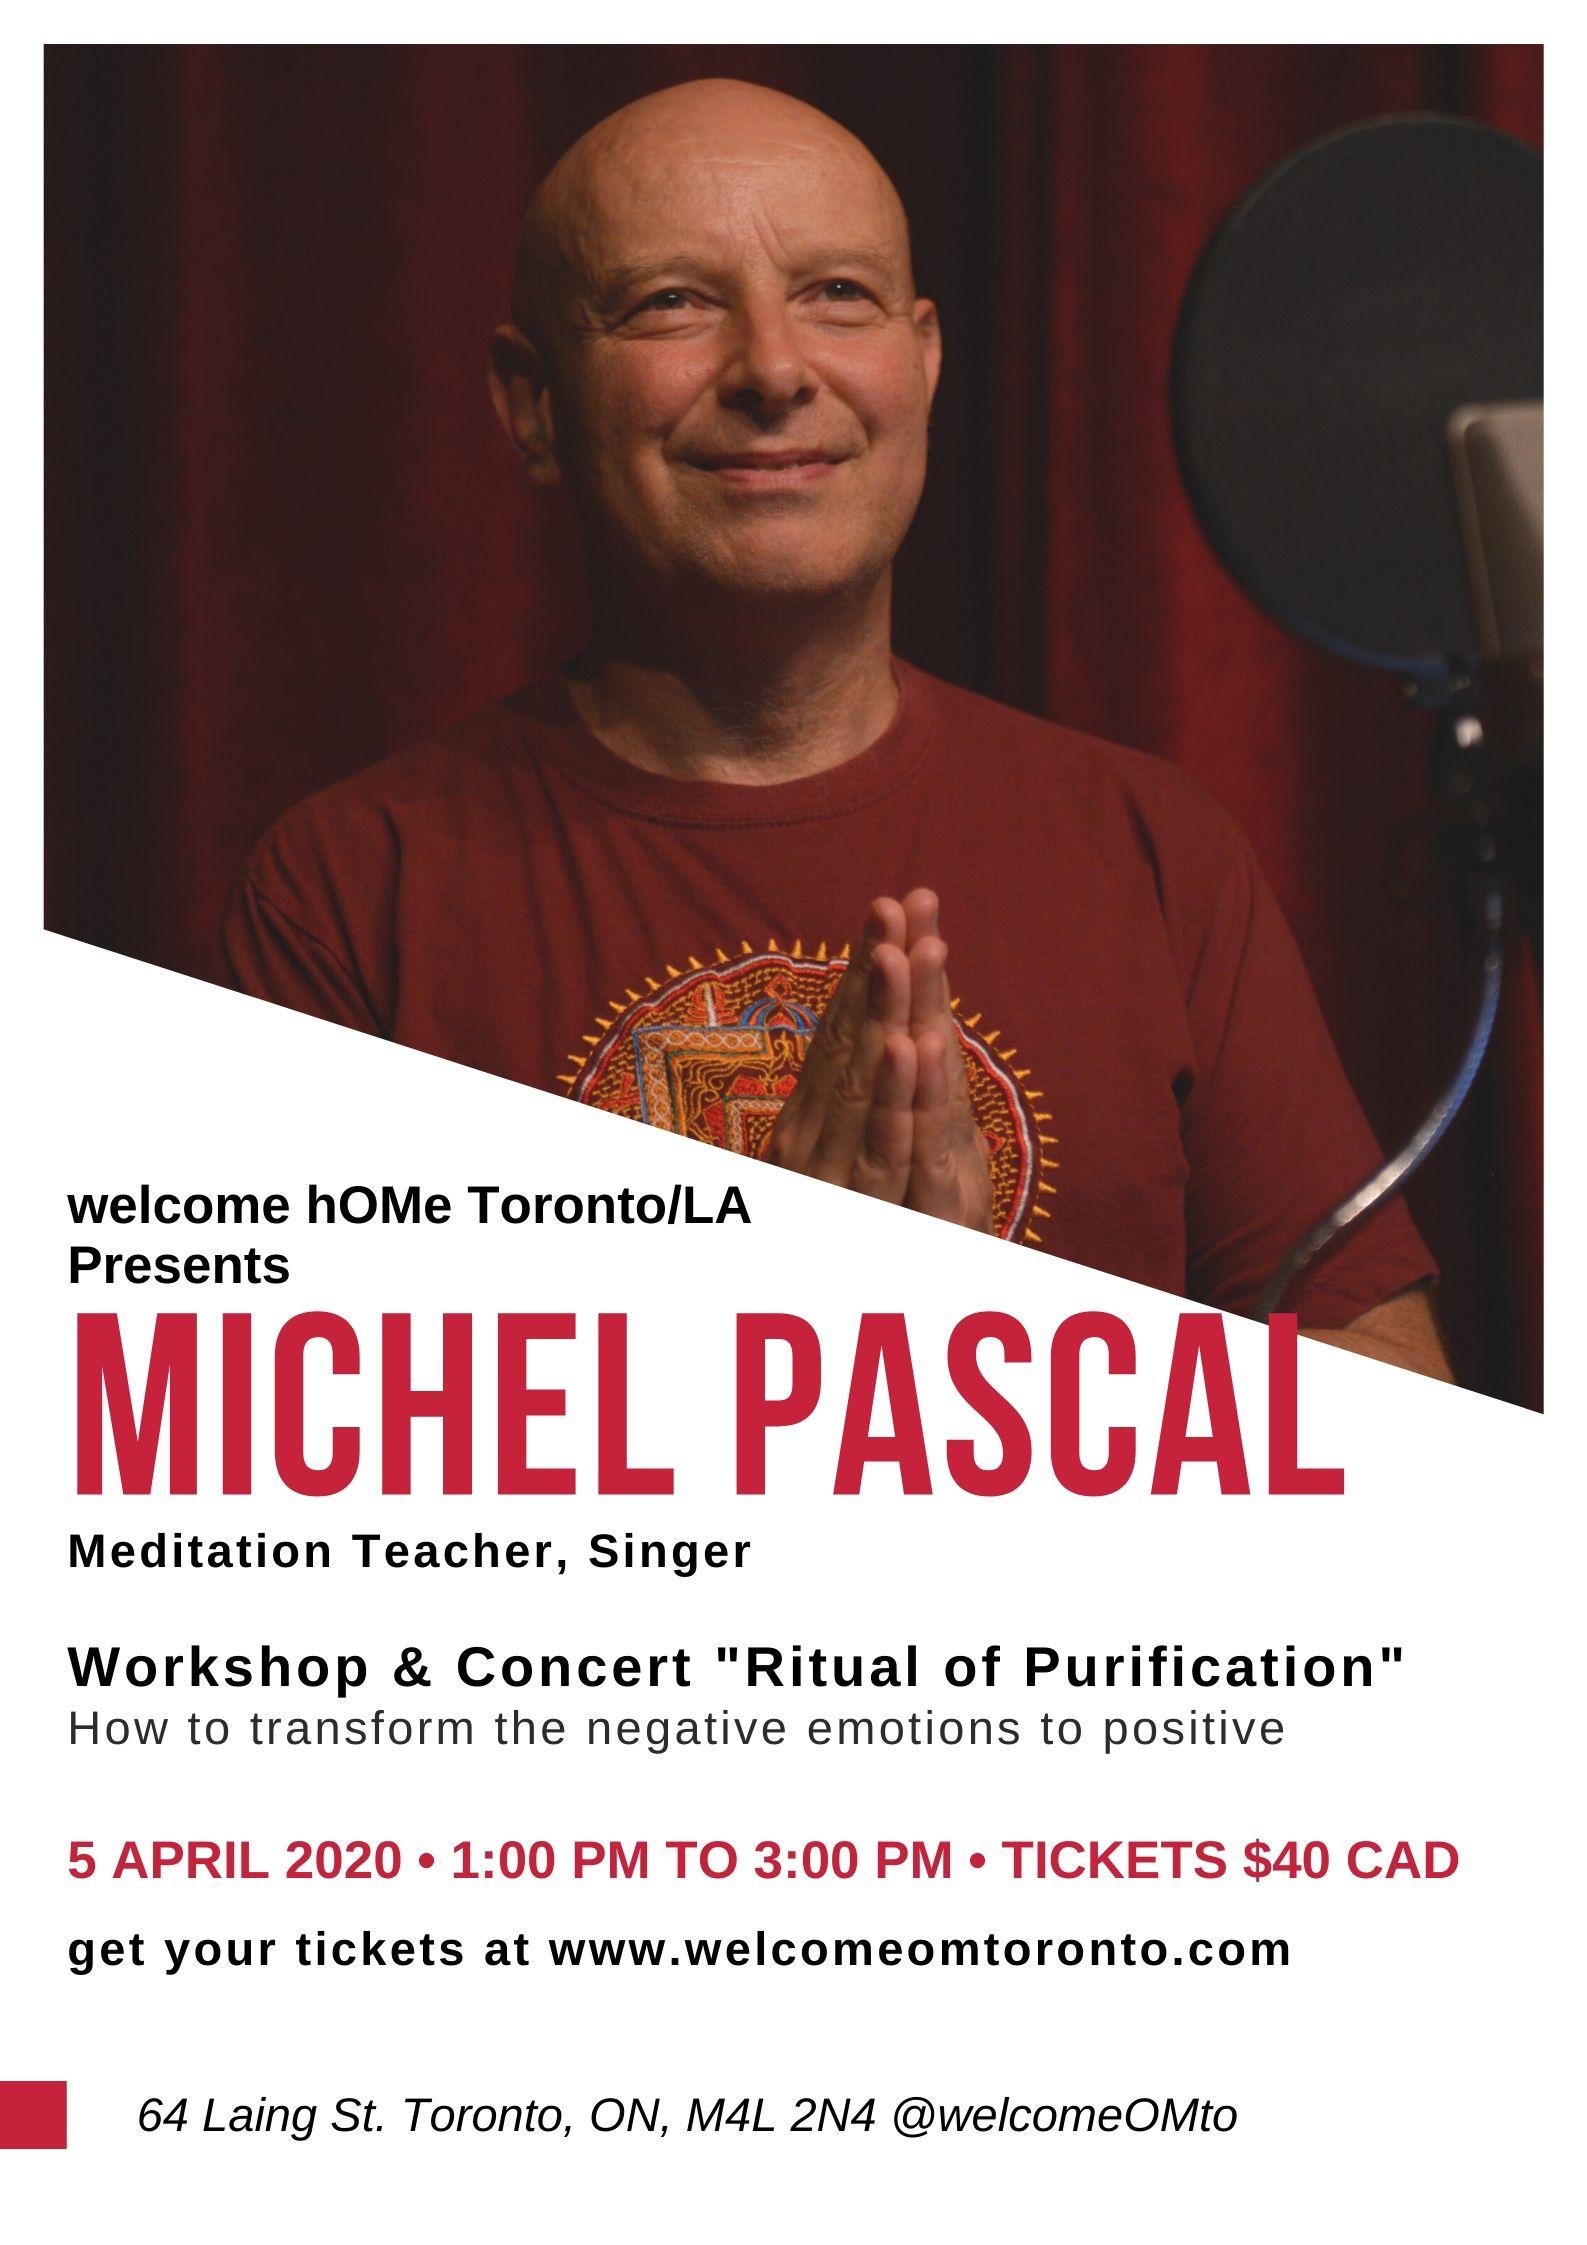 Michel Pascal welcome hOMe Toronto_LA APRIL 5